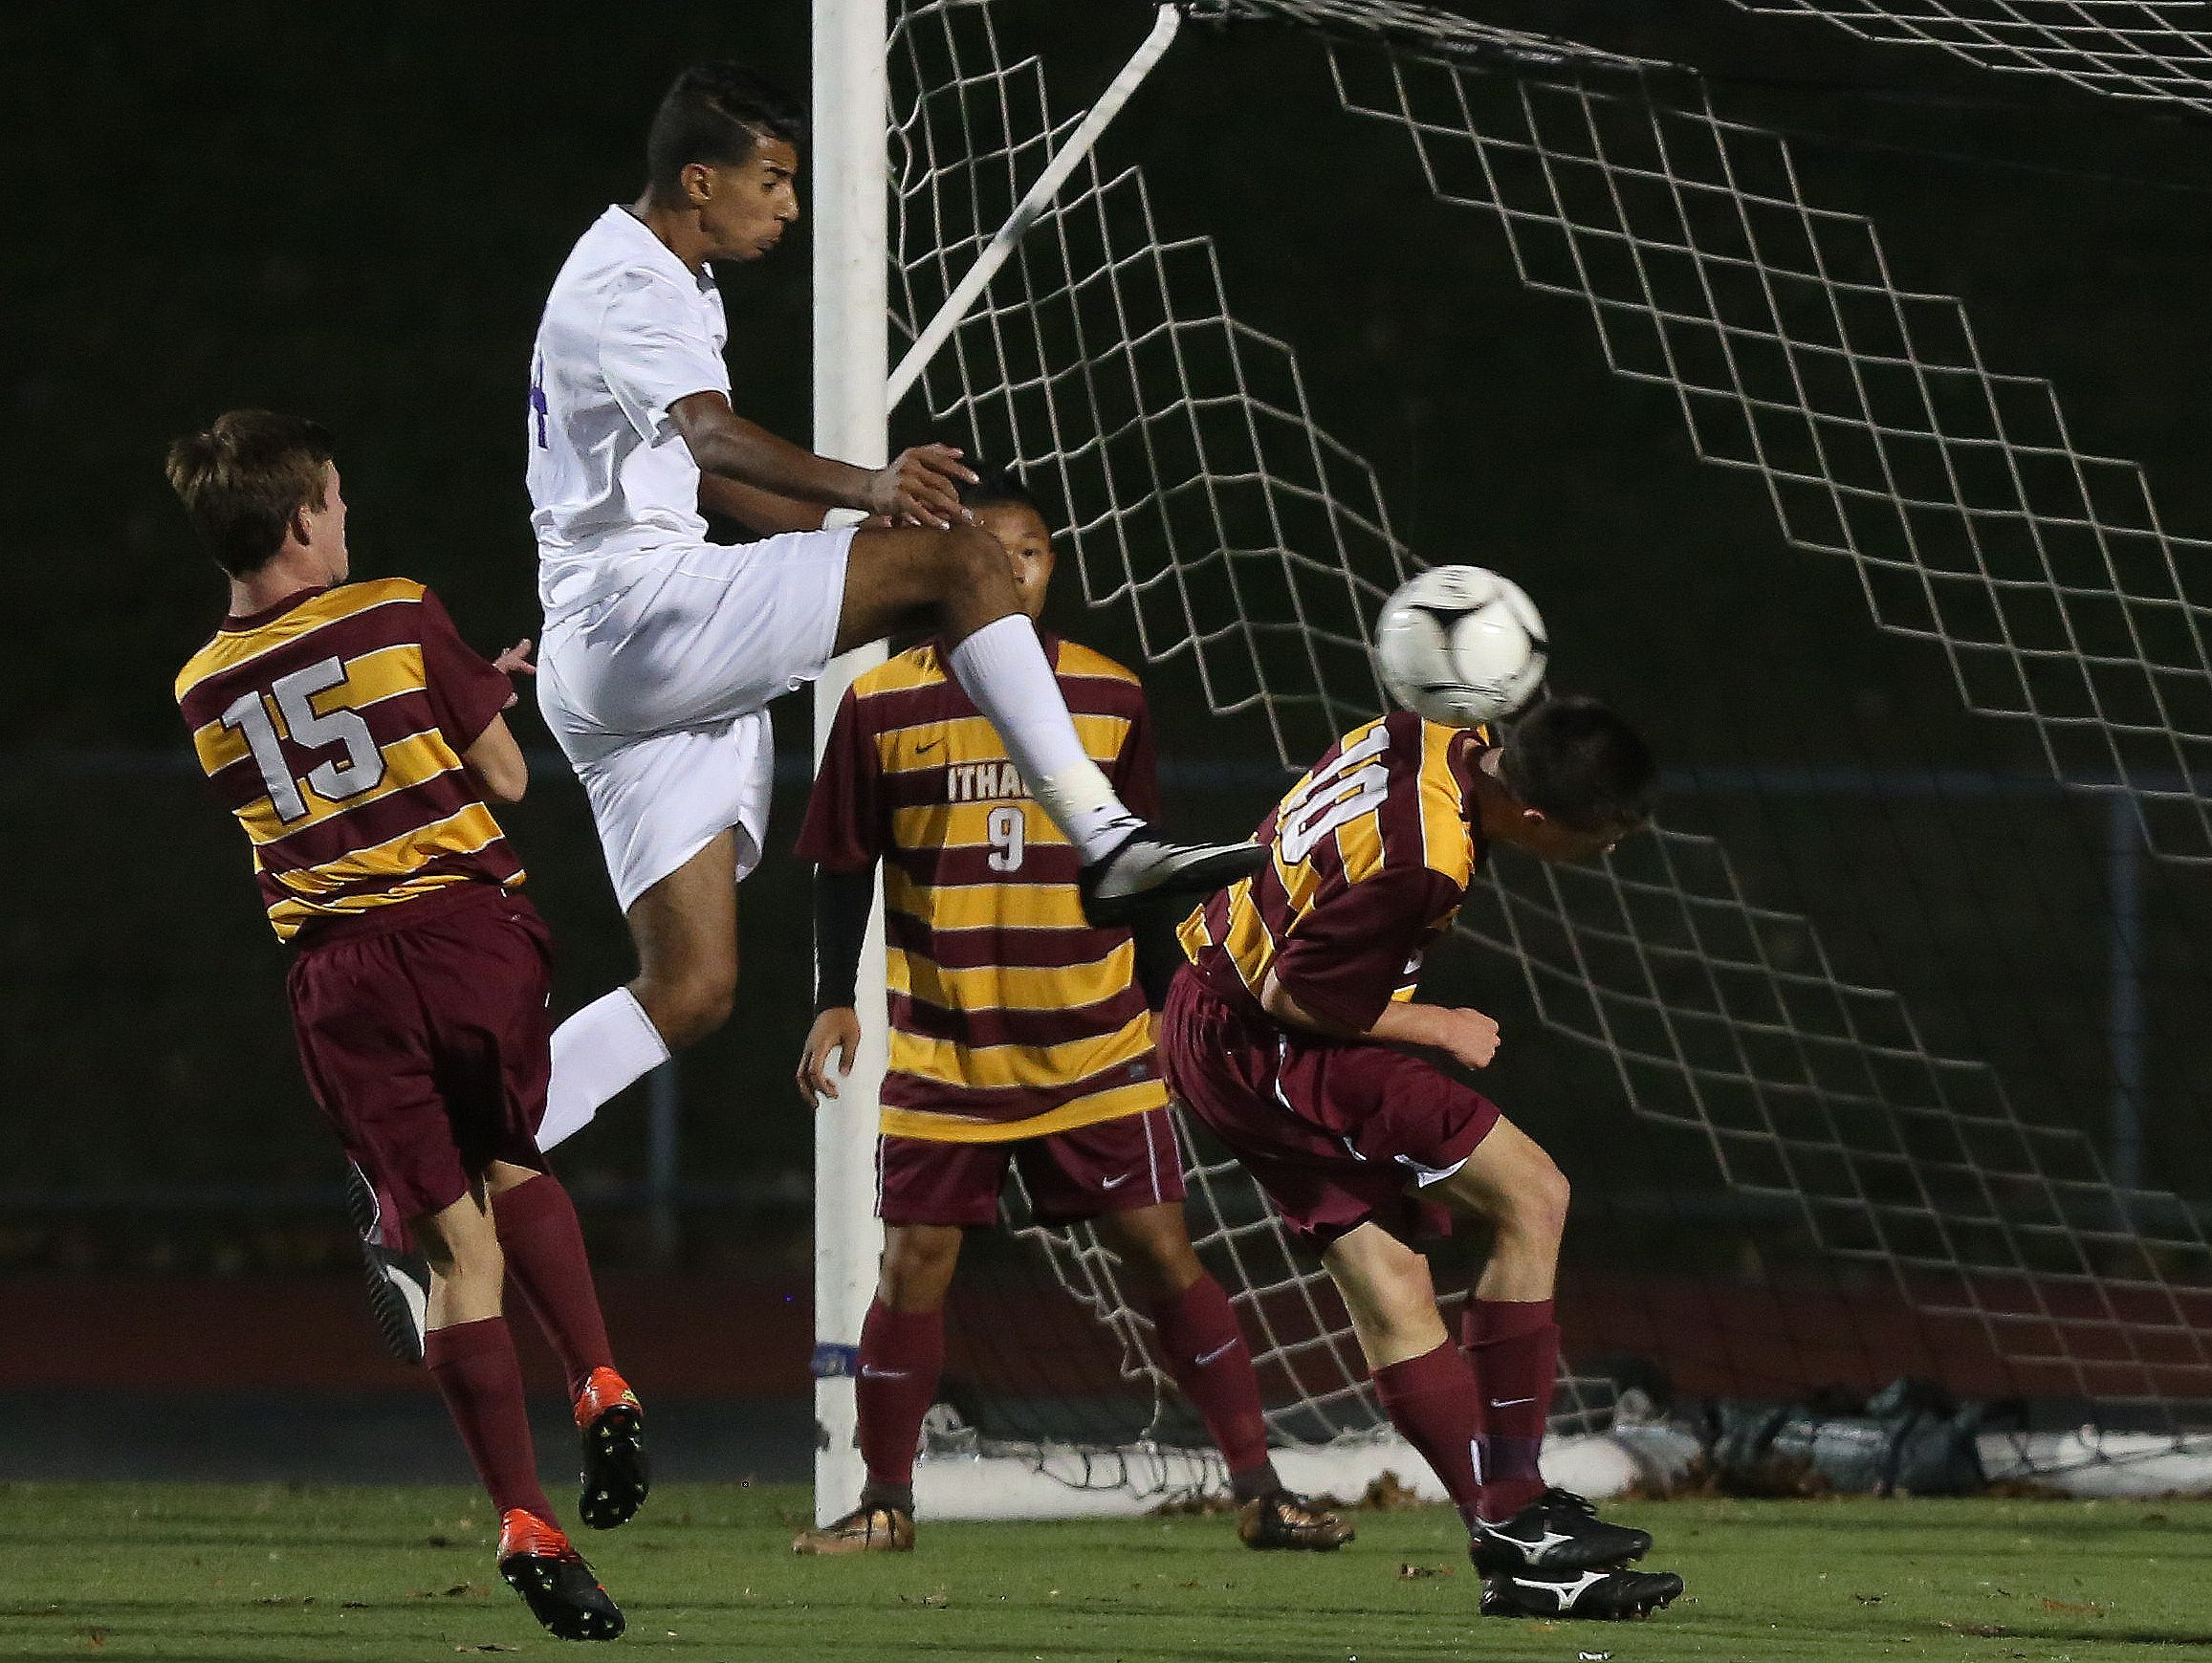 New Rochelle's (14) kicks the ball away from an Ithaca defender during the boys soccer regional semifinal at Lakeland High School in Shrub Oak Nov. 2, 2016.